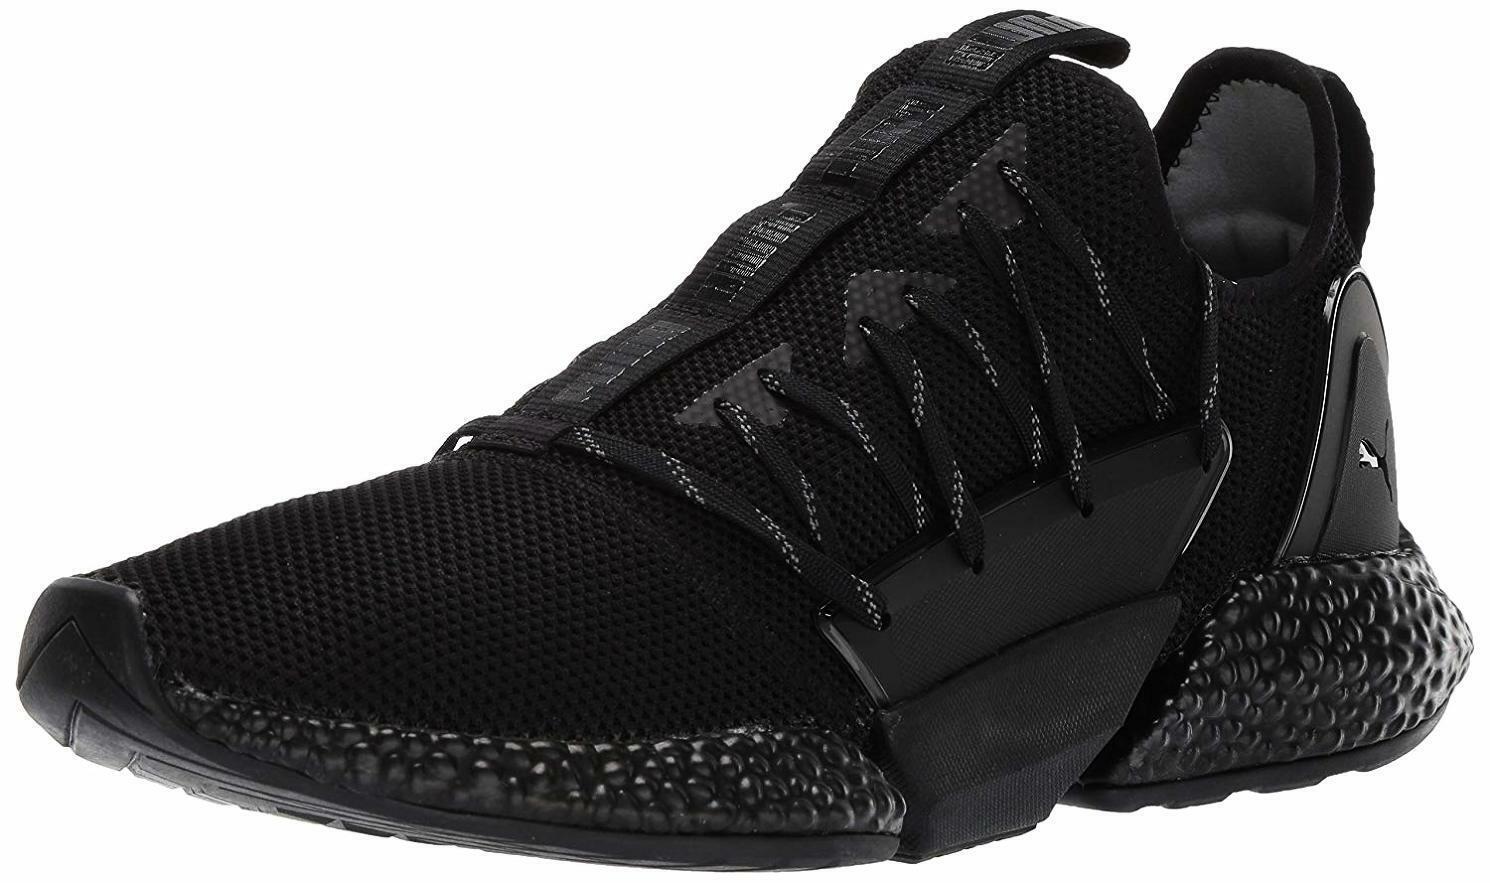 PUMA Men's Hybrid Rocket Runner Sneaker - Choose SZ color